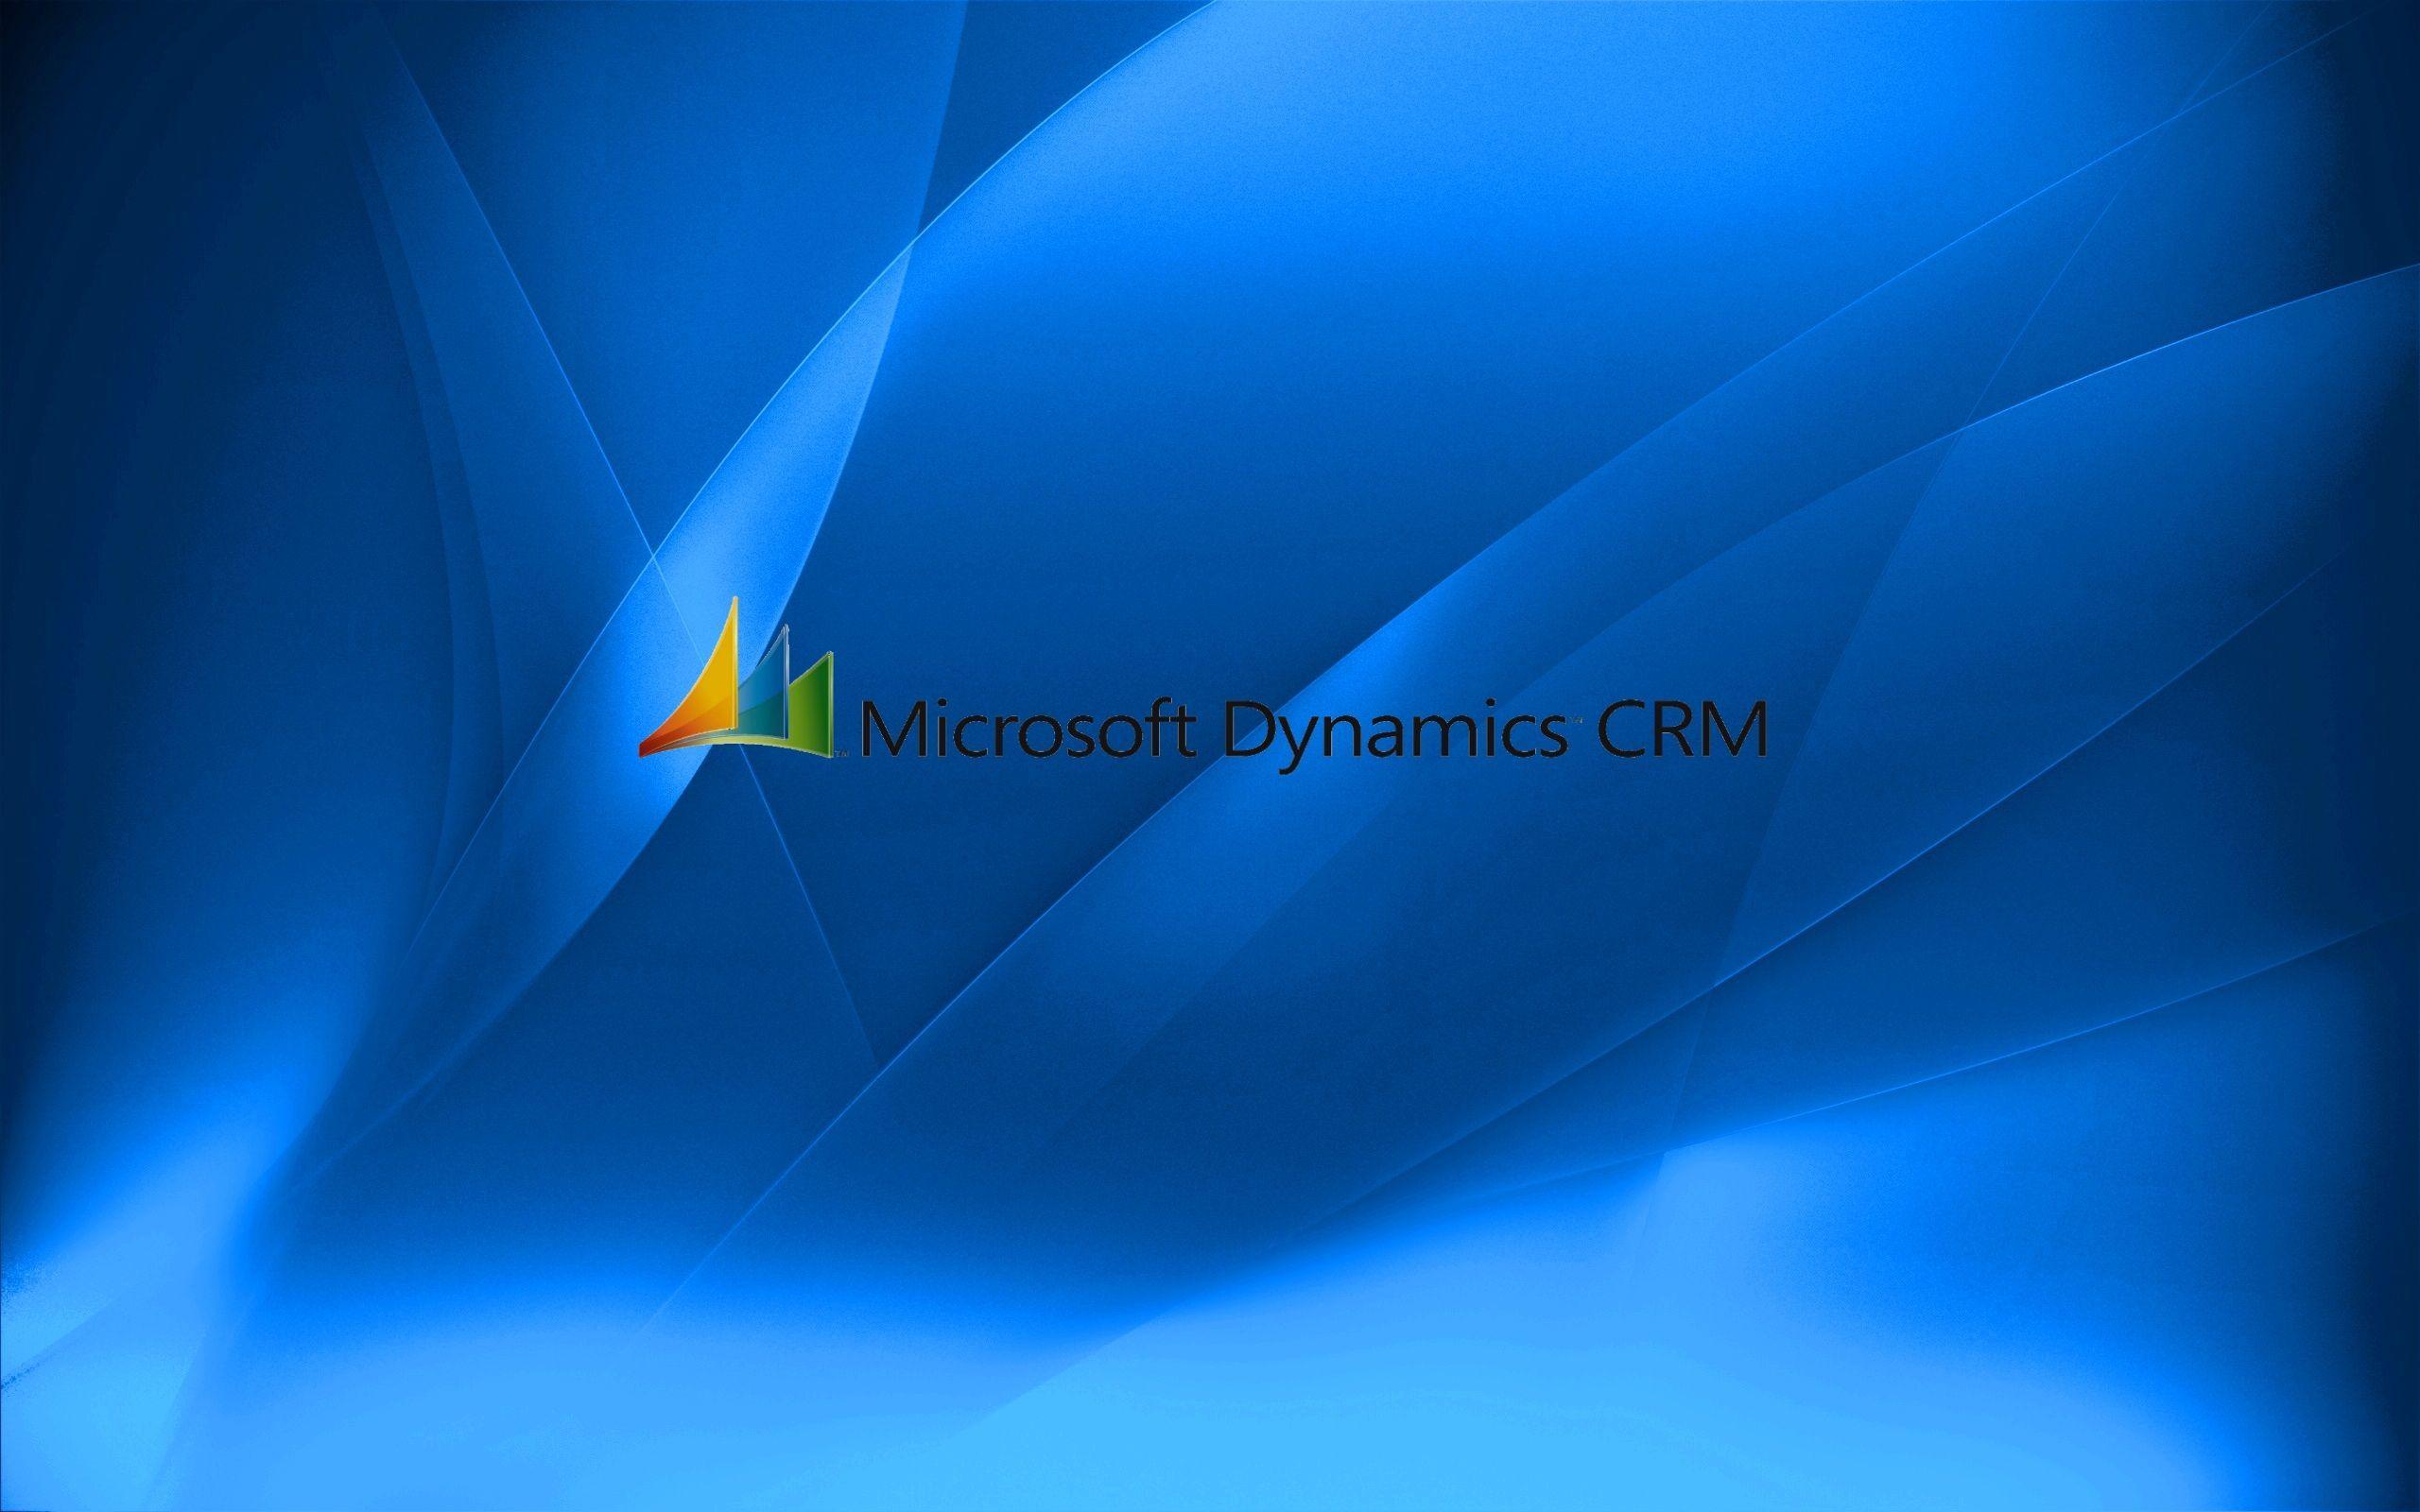 microsoft free backgrounds